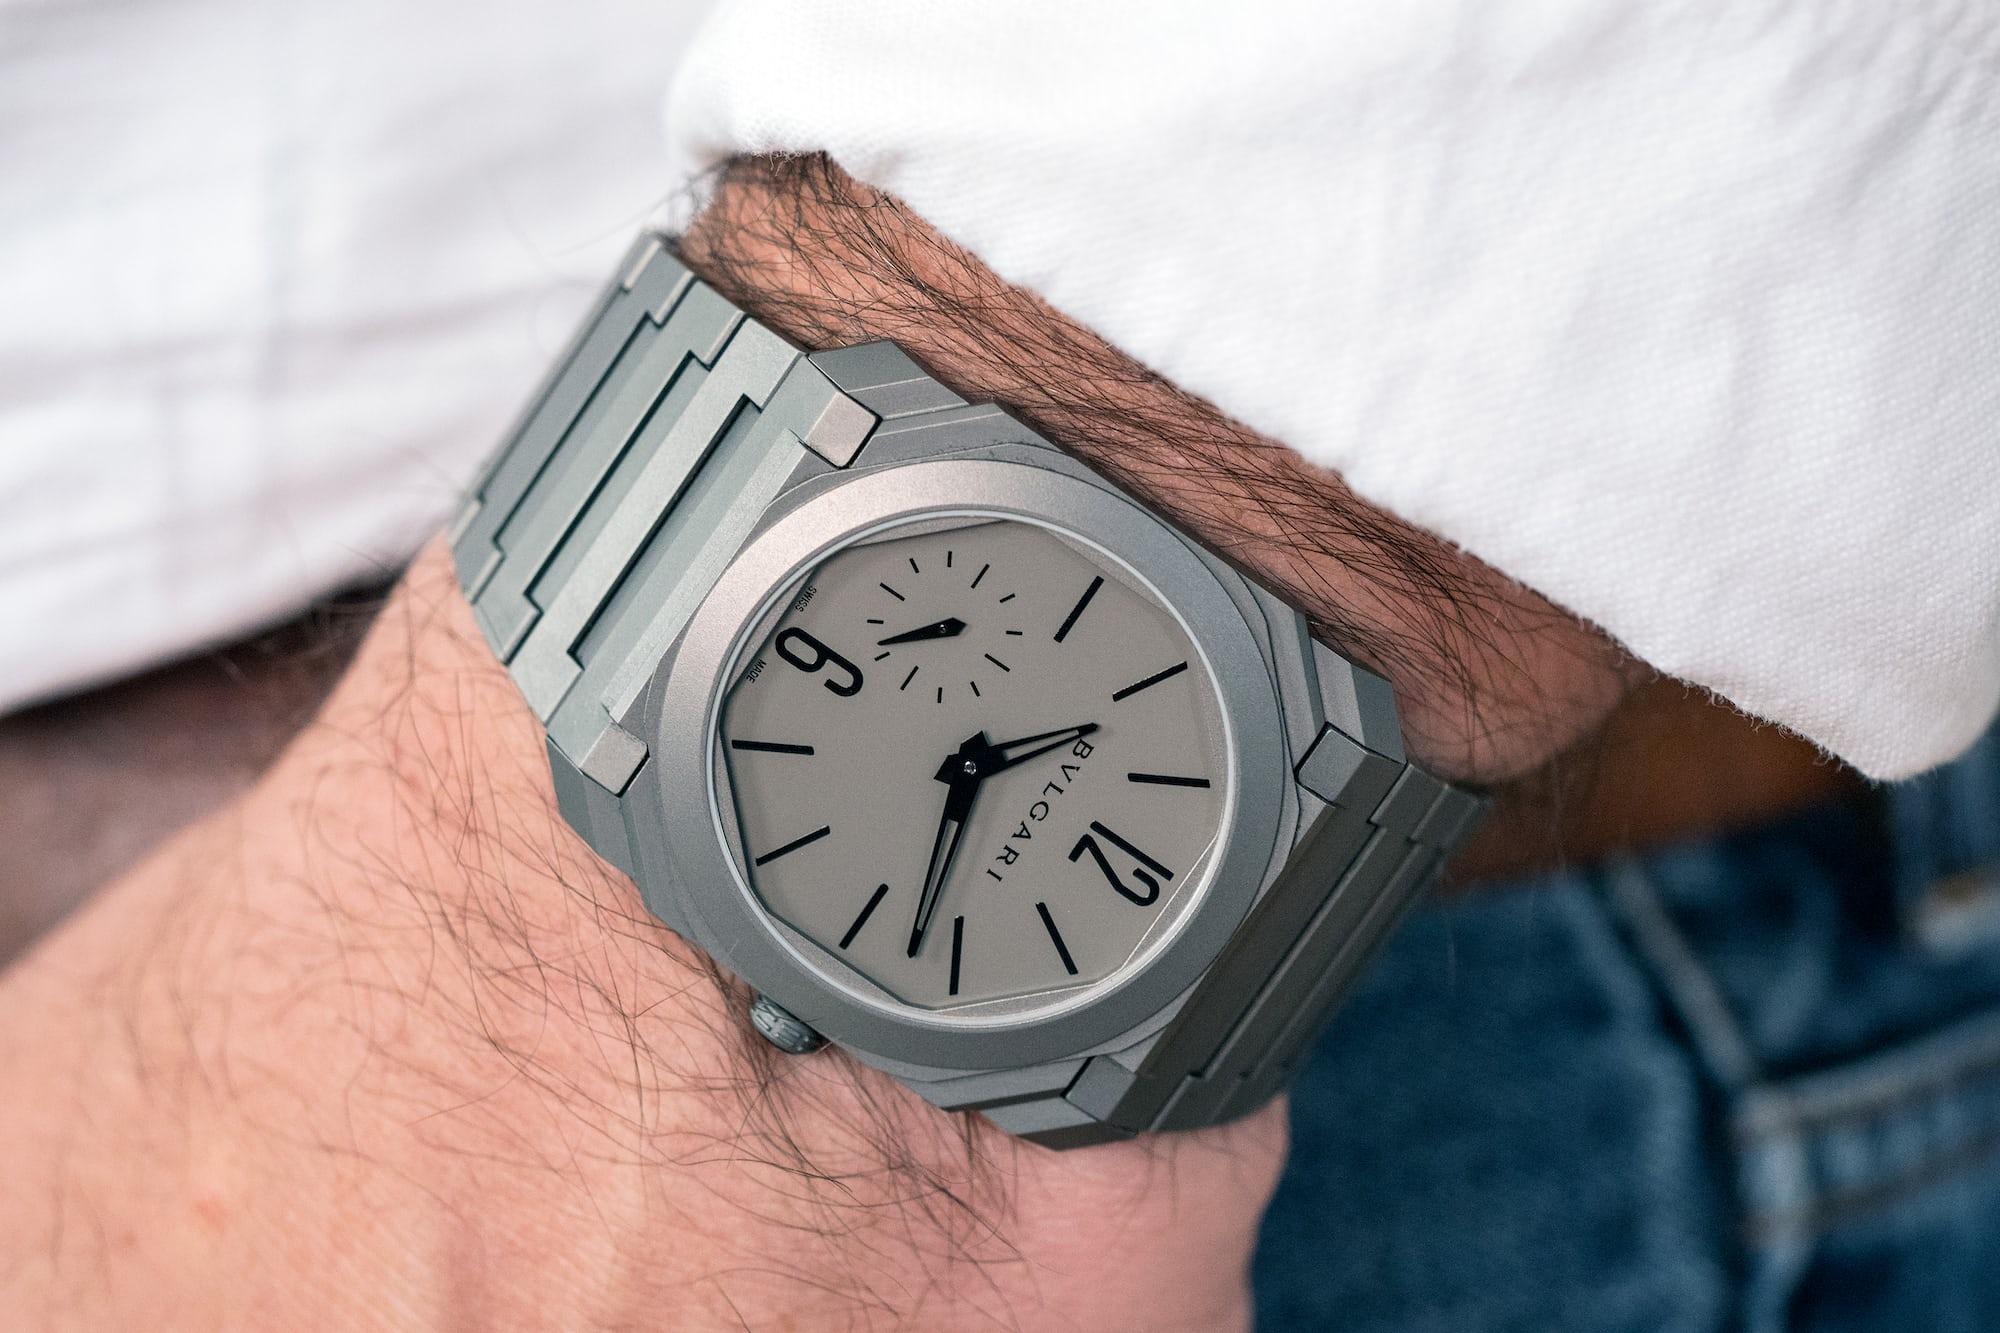 The Bulgari Octo Finissimo Automatique wrist shot A Week On The Wrist: The Bulgari Octo Finissimo Ultra-Thin Automatique A Week On The Wrist: The Bulgari Octo Finissimo Ultra-Thin Automatique P8093330